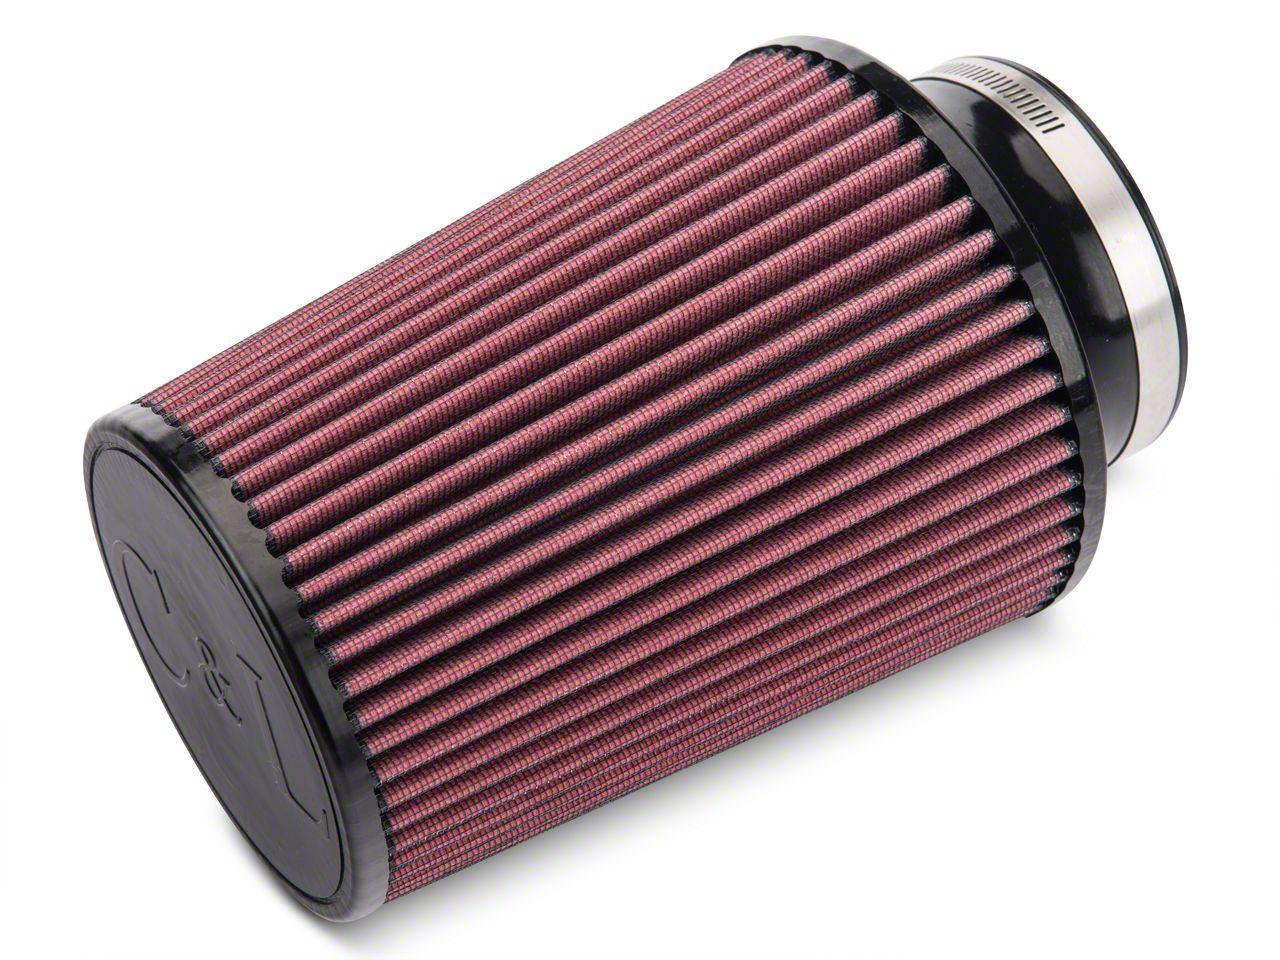 2005 2009 mustang air, oil \u0026 fuel filters americanmuscle Yamaha Fuel Filter c\u0026l